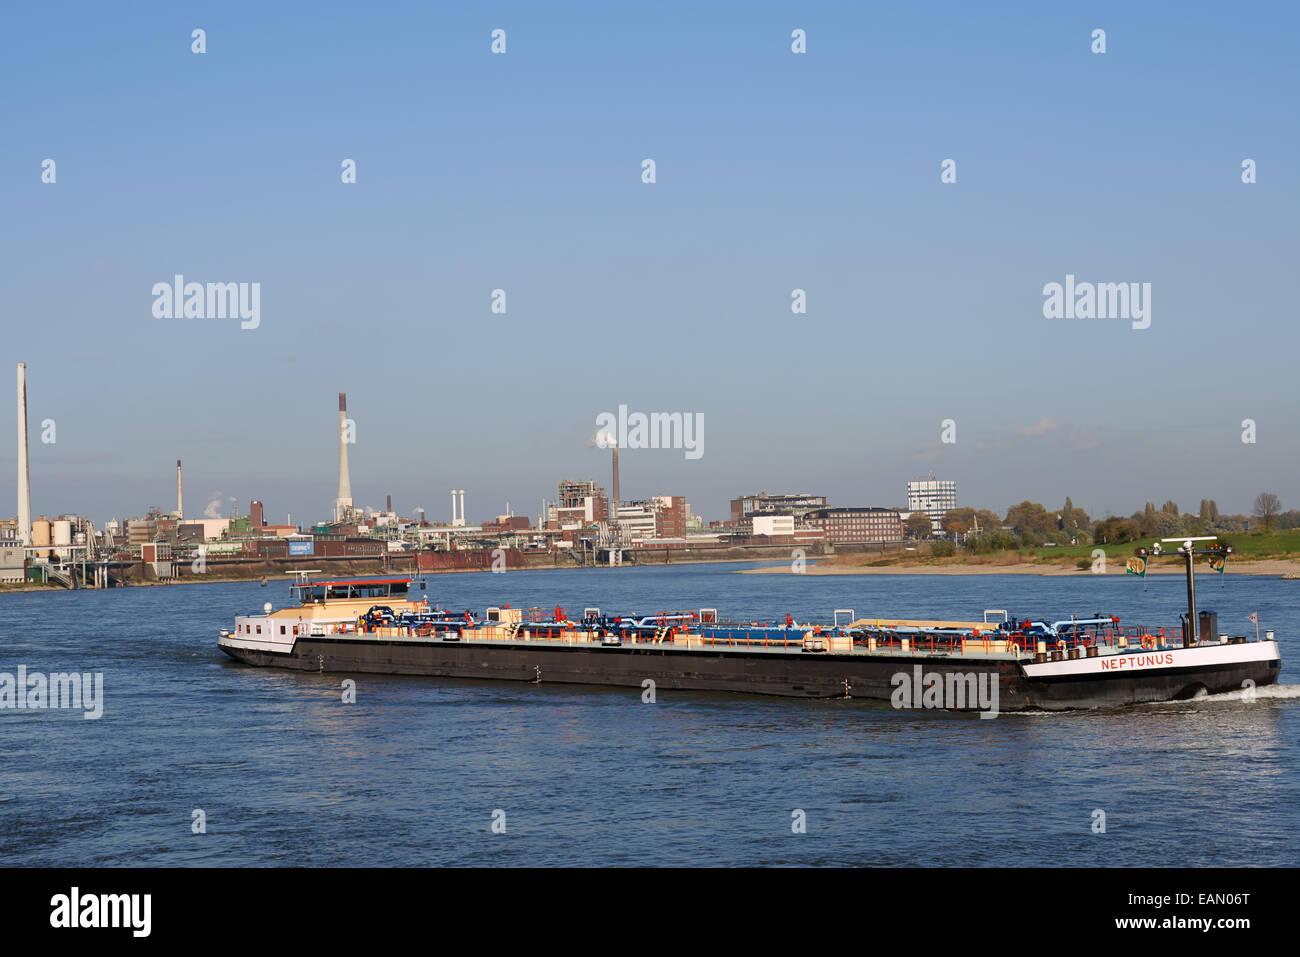 Oil tanker Neptunus sailing on the river Rhine, Krefeld, Germany. - Stock Image